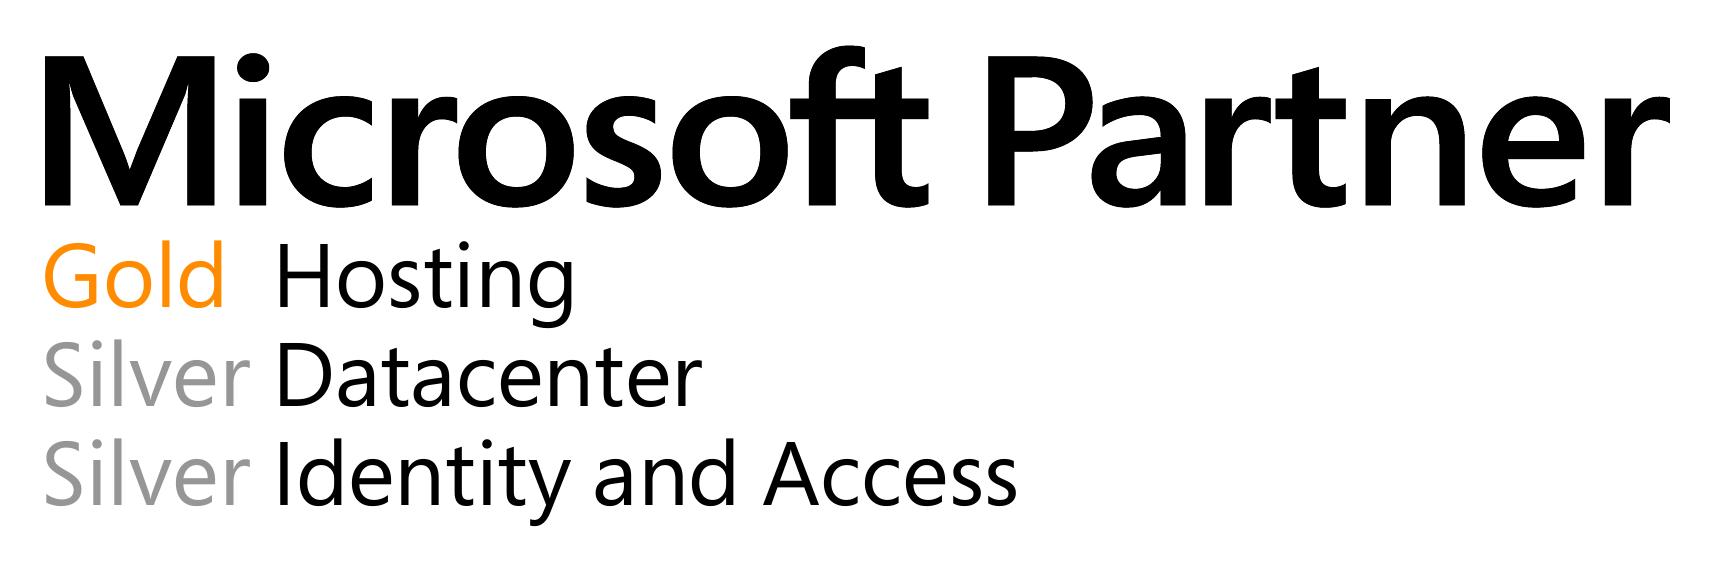 Microsof Partner Logo